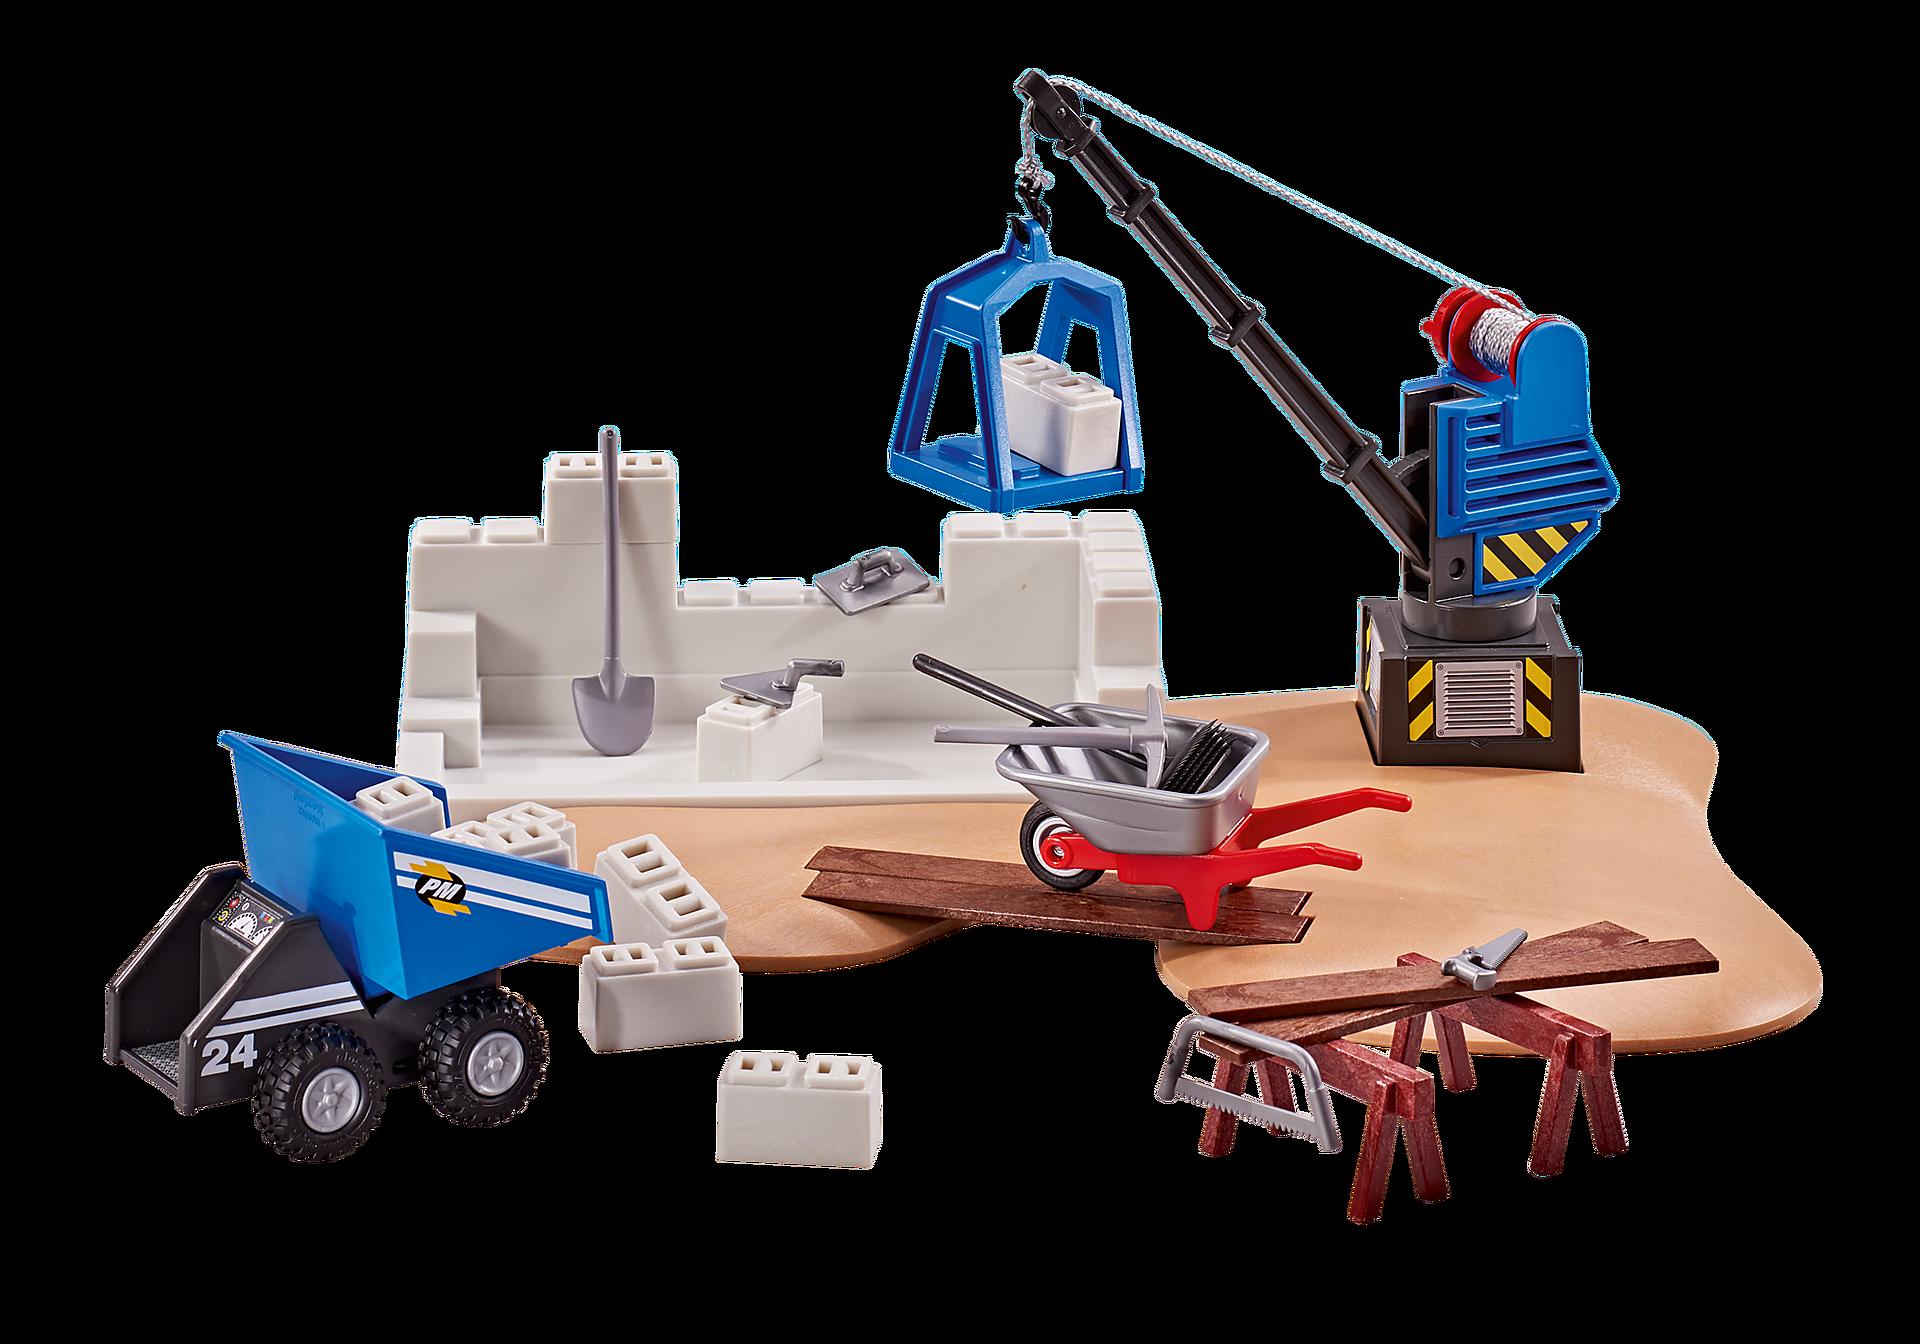 http://media.playmobil.com/i/playmobil/6553_product_detail/Obra